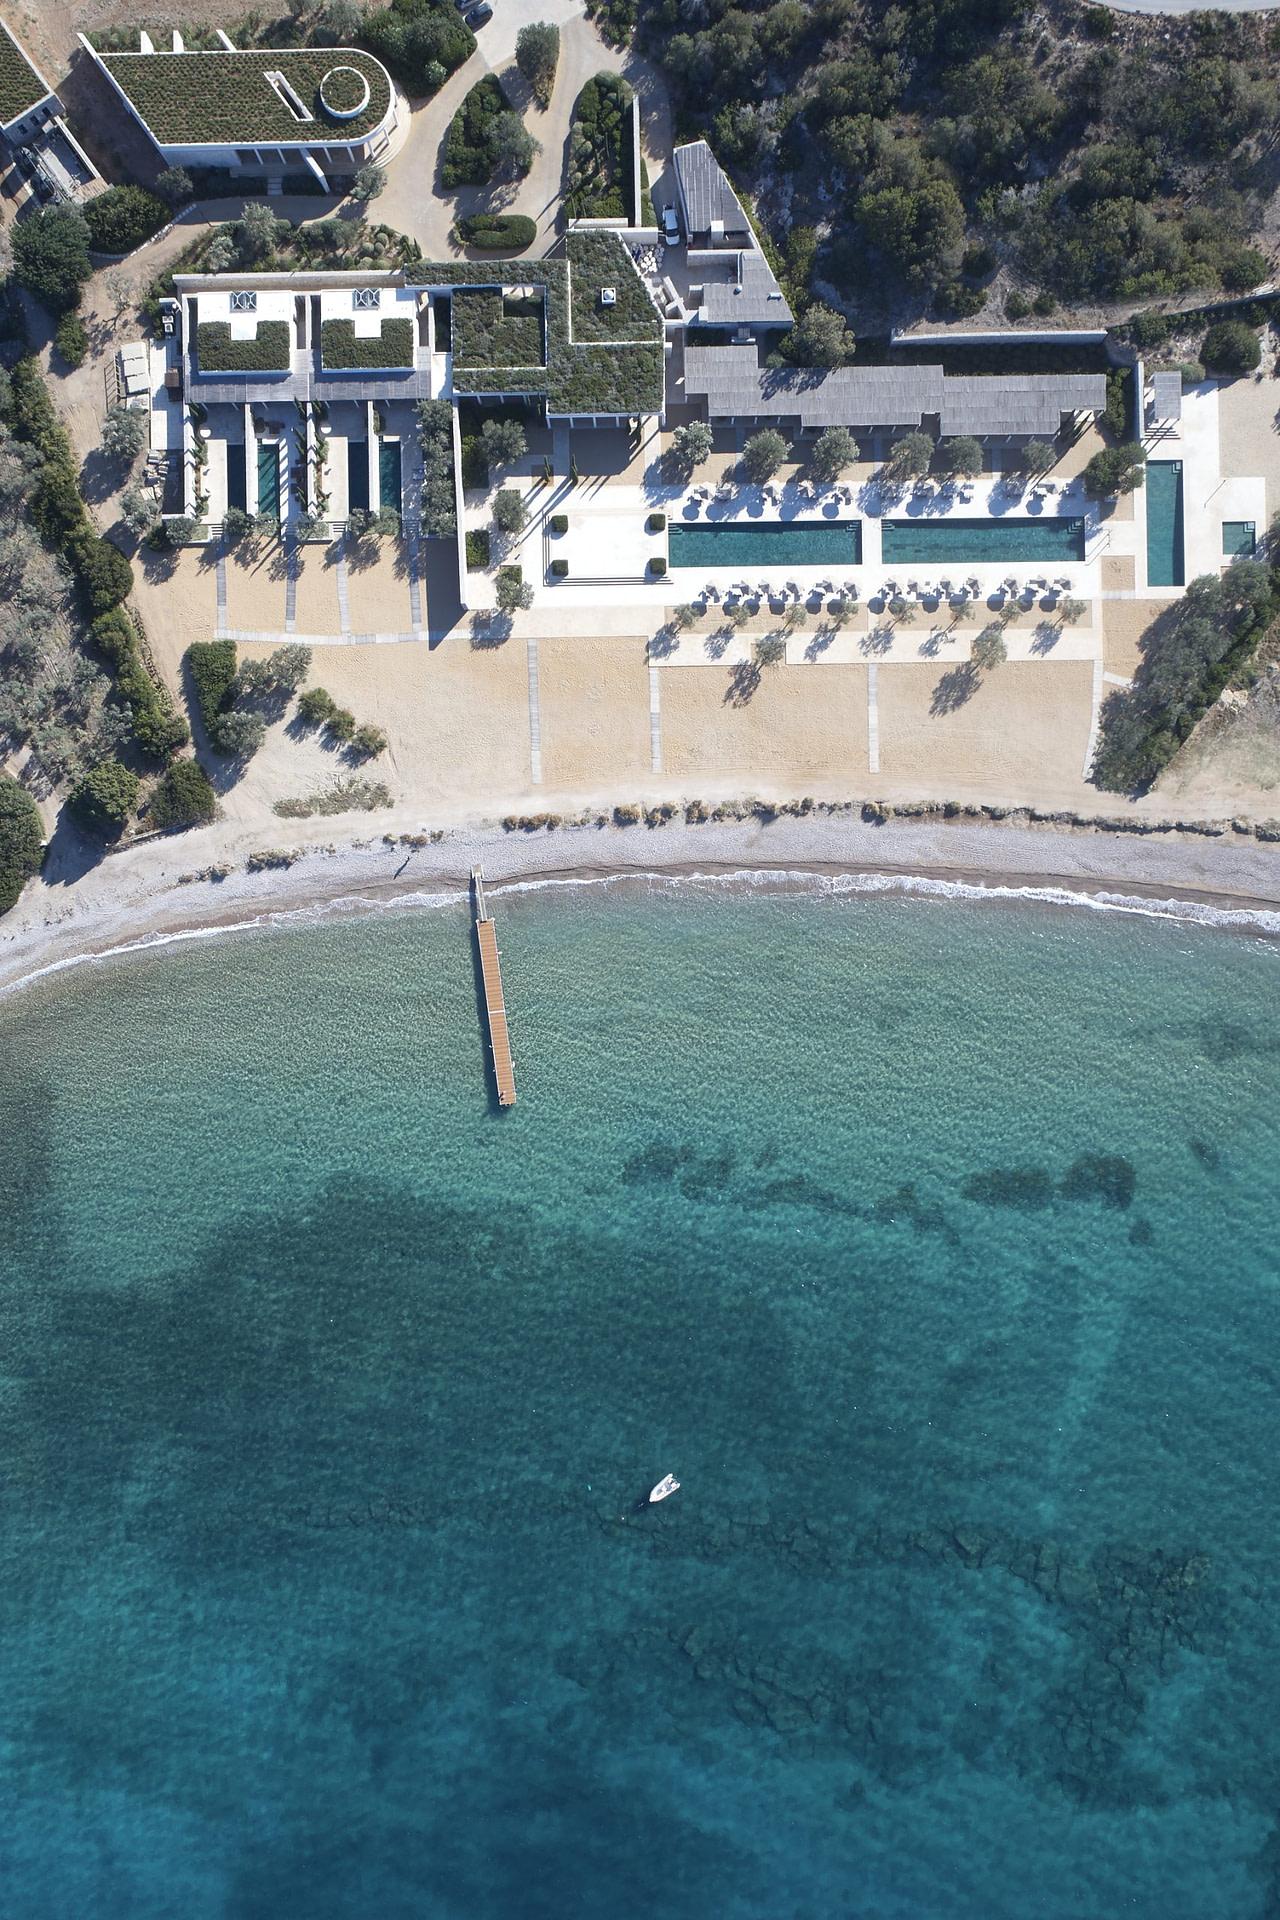 Beach Club Aerial - birds eye view.tif